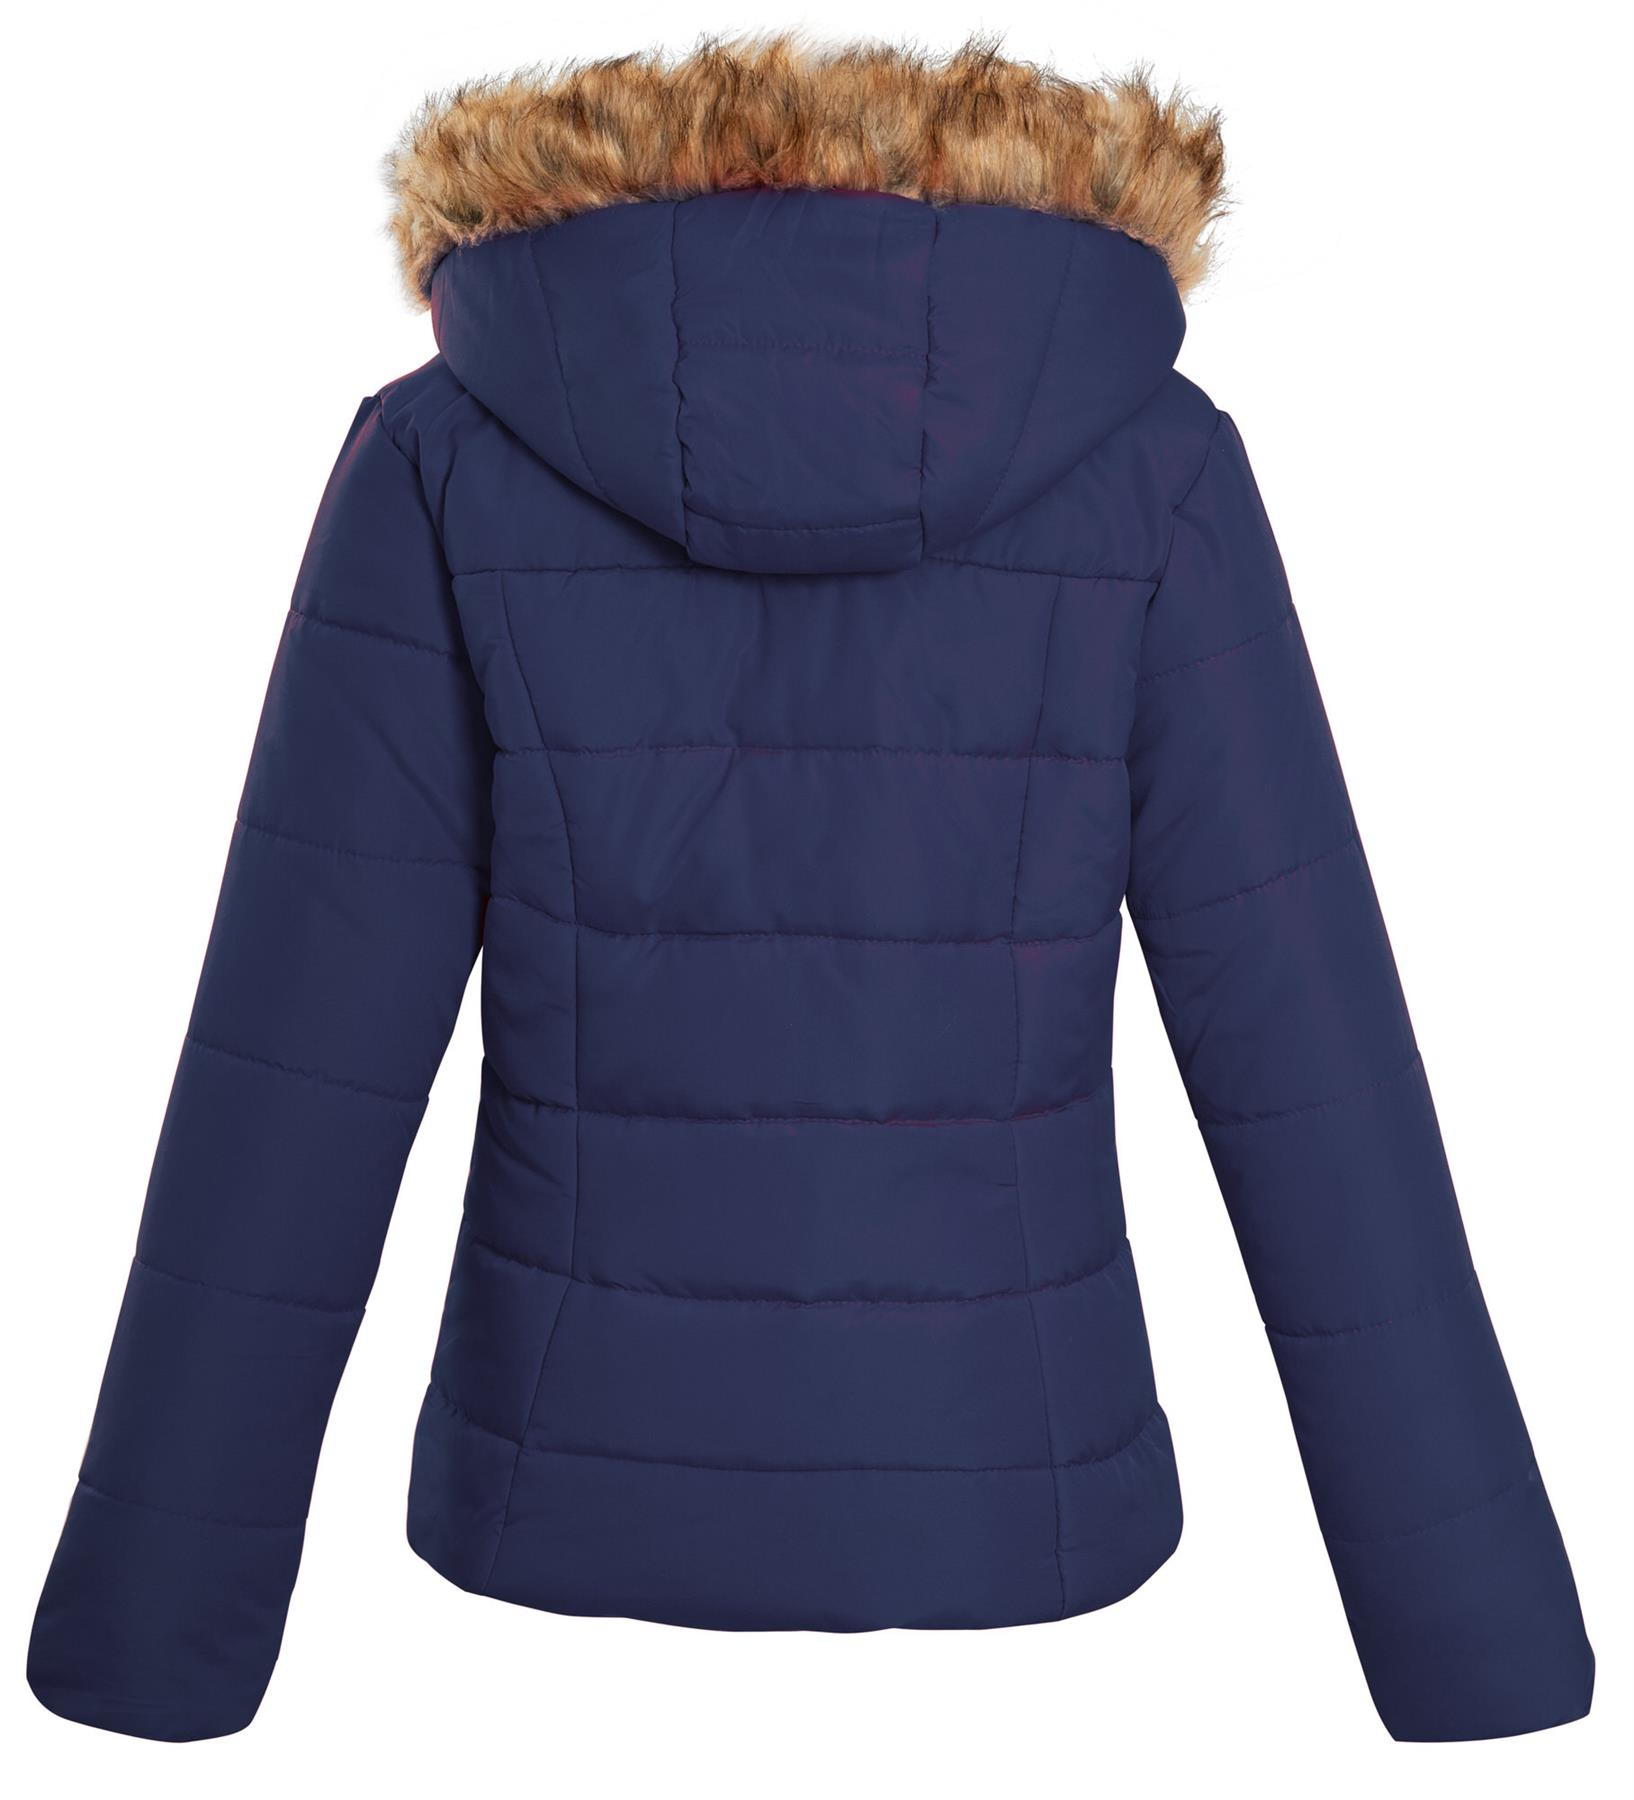 Shelikes-Ladies-Padded-Faux-Fur-Trim-Hood-Hooded-Jacket-Winter-Coat-Size-6-to-16 miniatuur 7